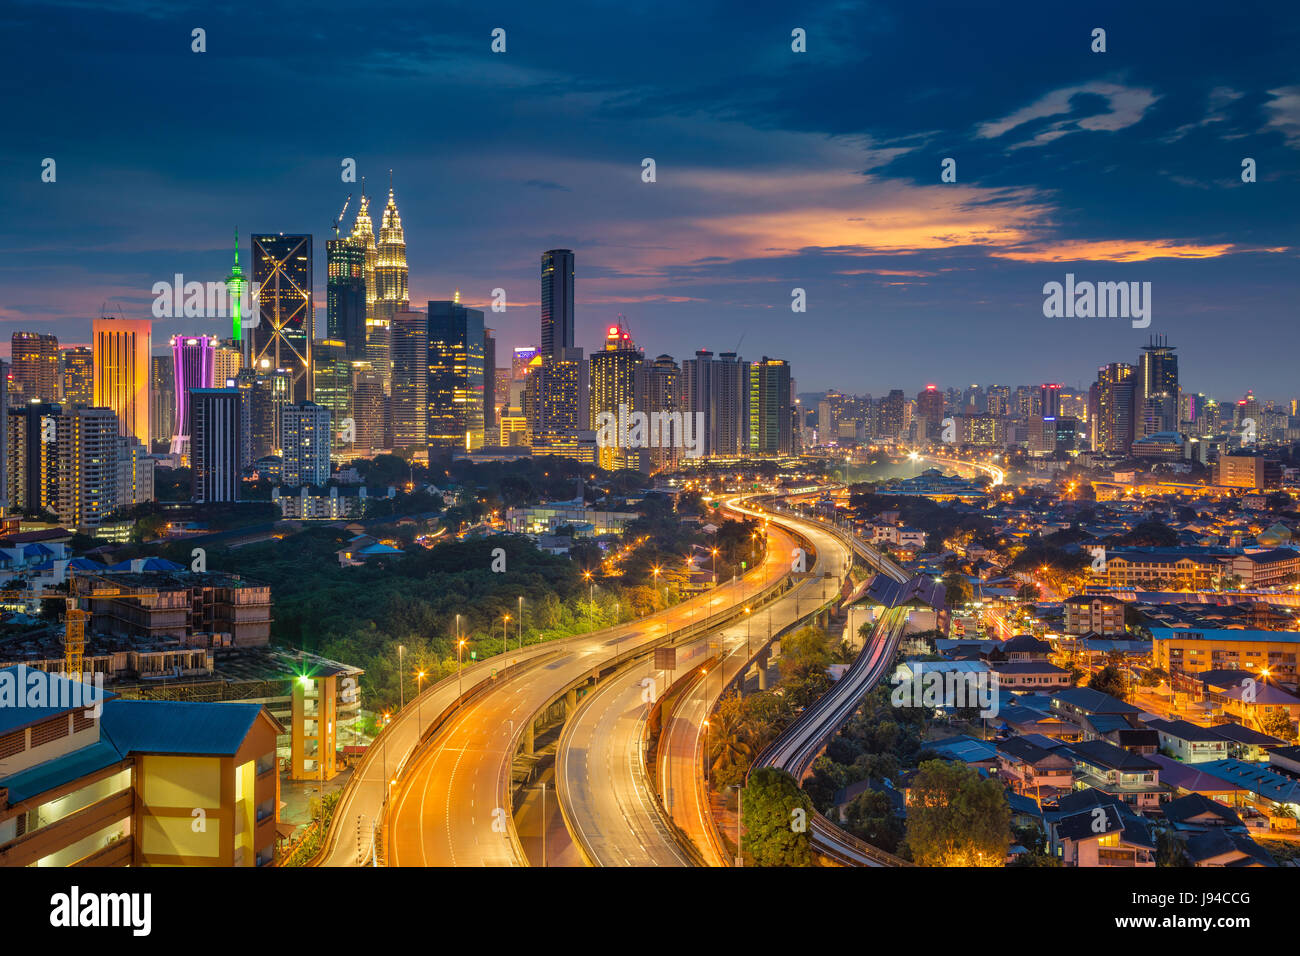 Kuala Lumpur. Cityscape image de Kuala Lumpur, en Malaisie, au coucher du soleil. Photo Stock